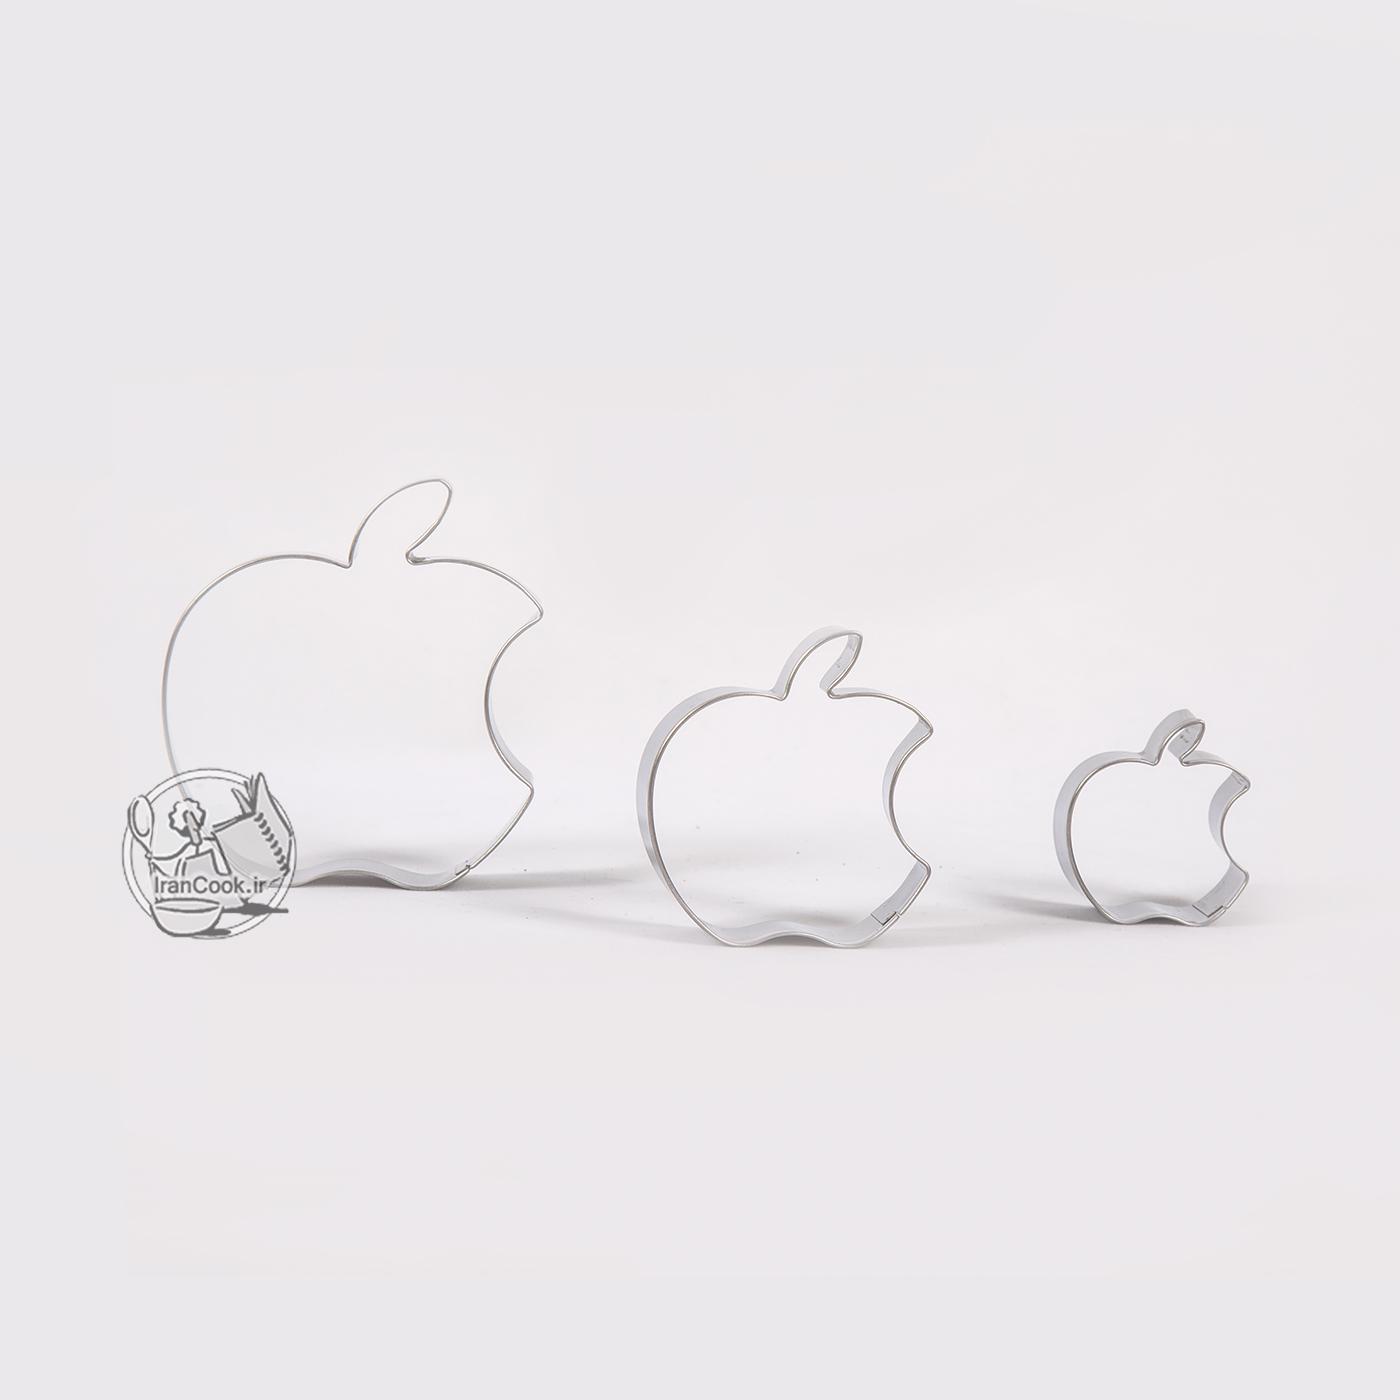 قالب برش 3 عددی طرح اپل